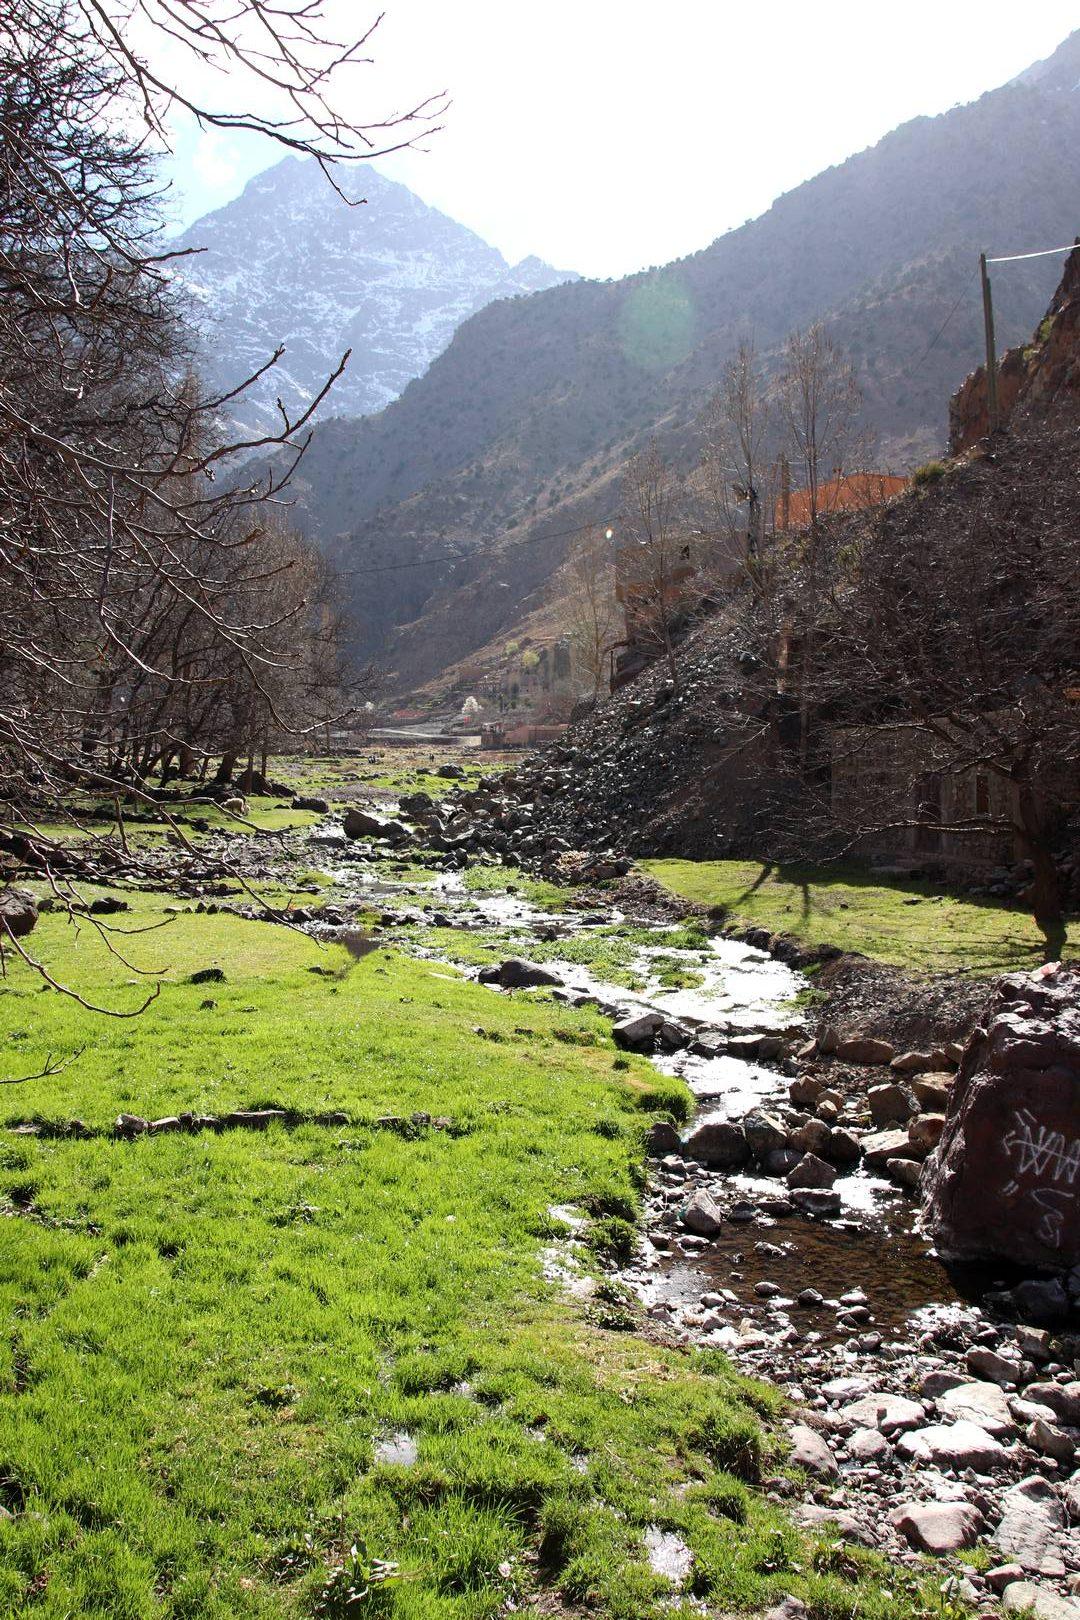 Maroc - Ruisseau dans la vallée d'Imlil